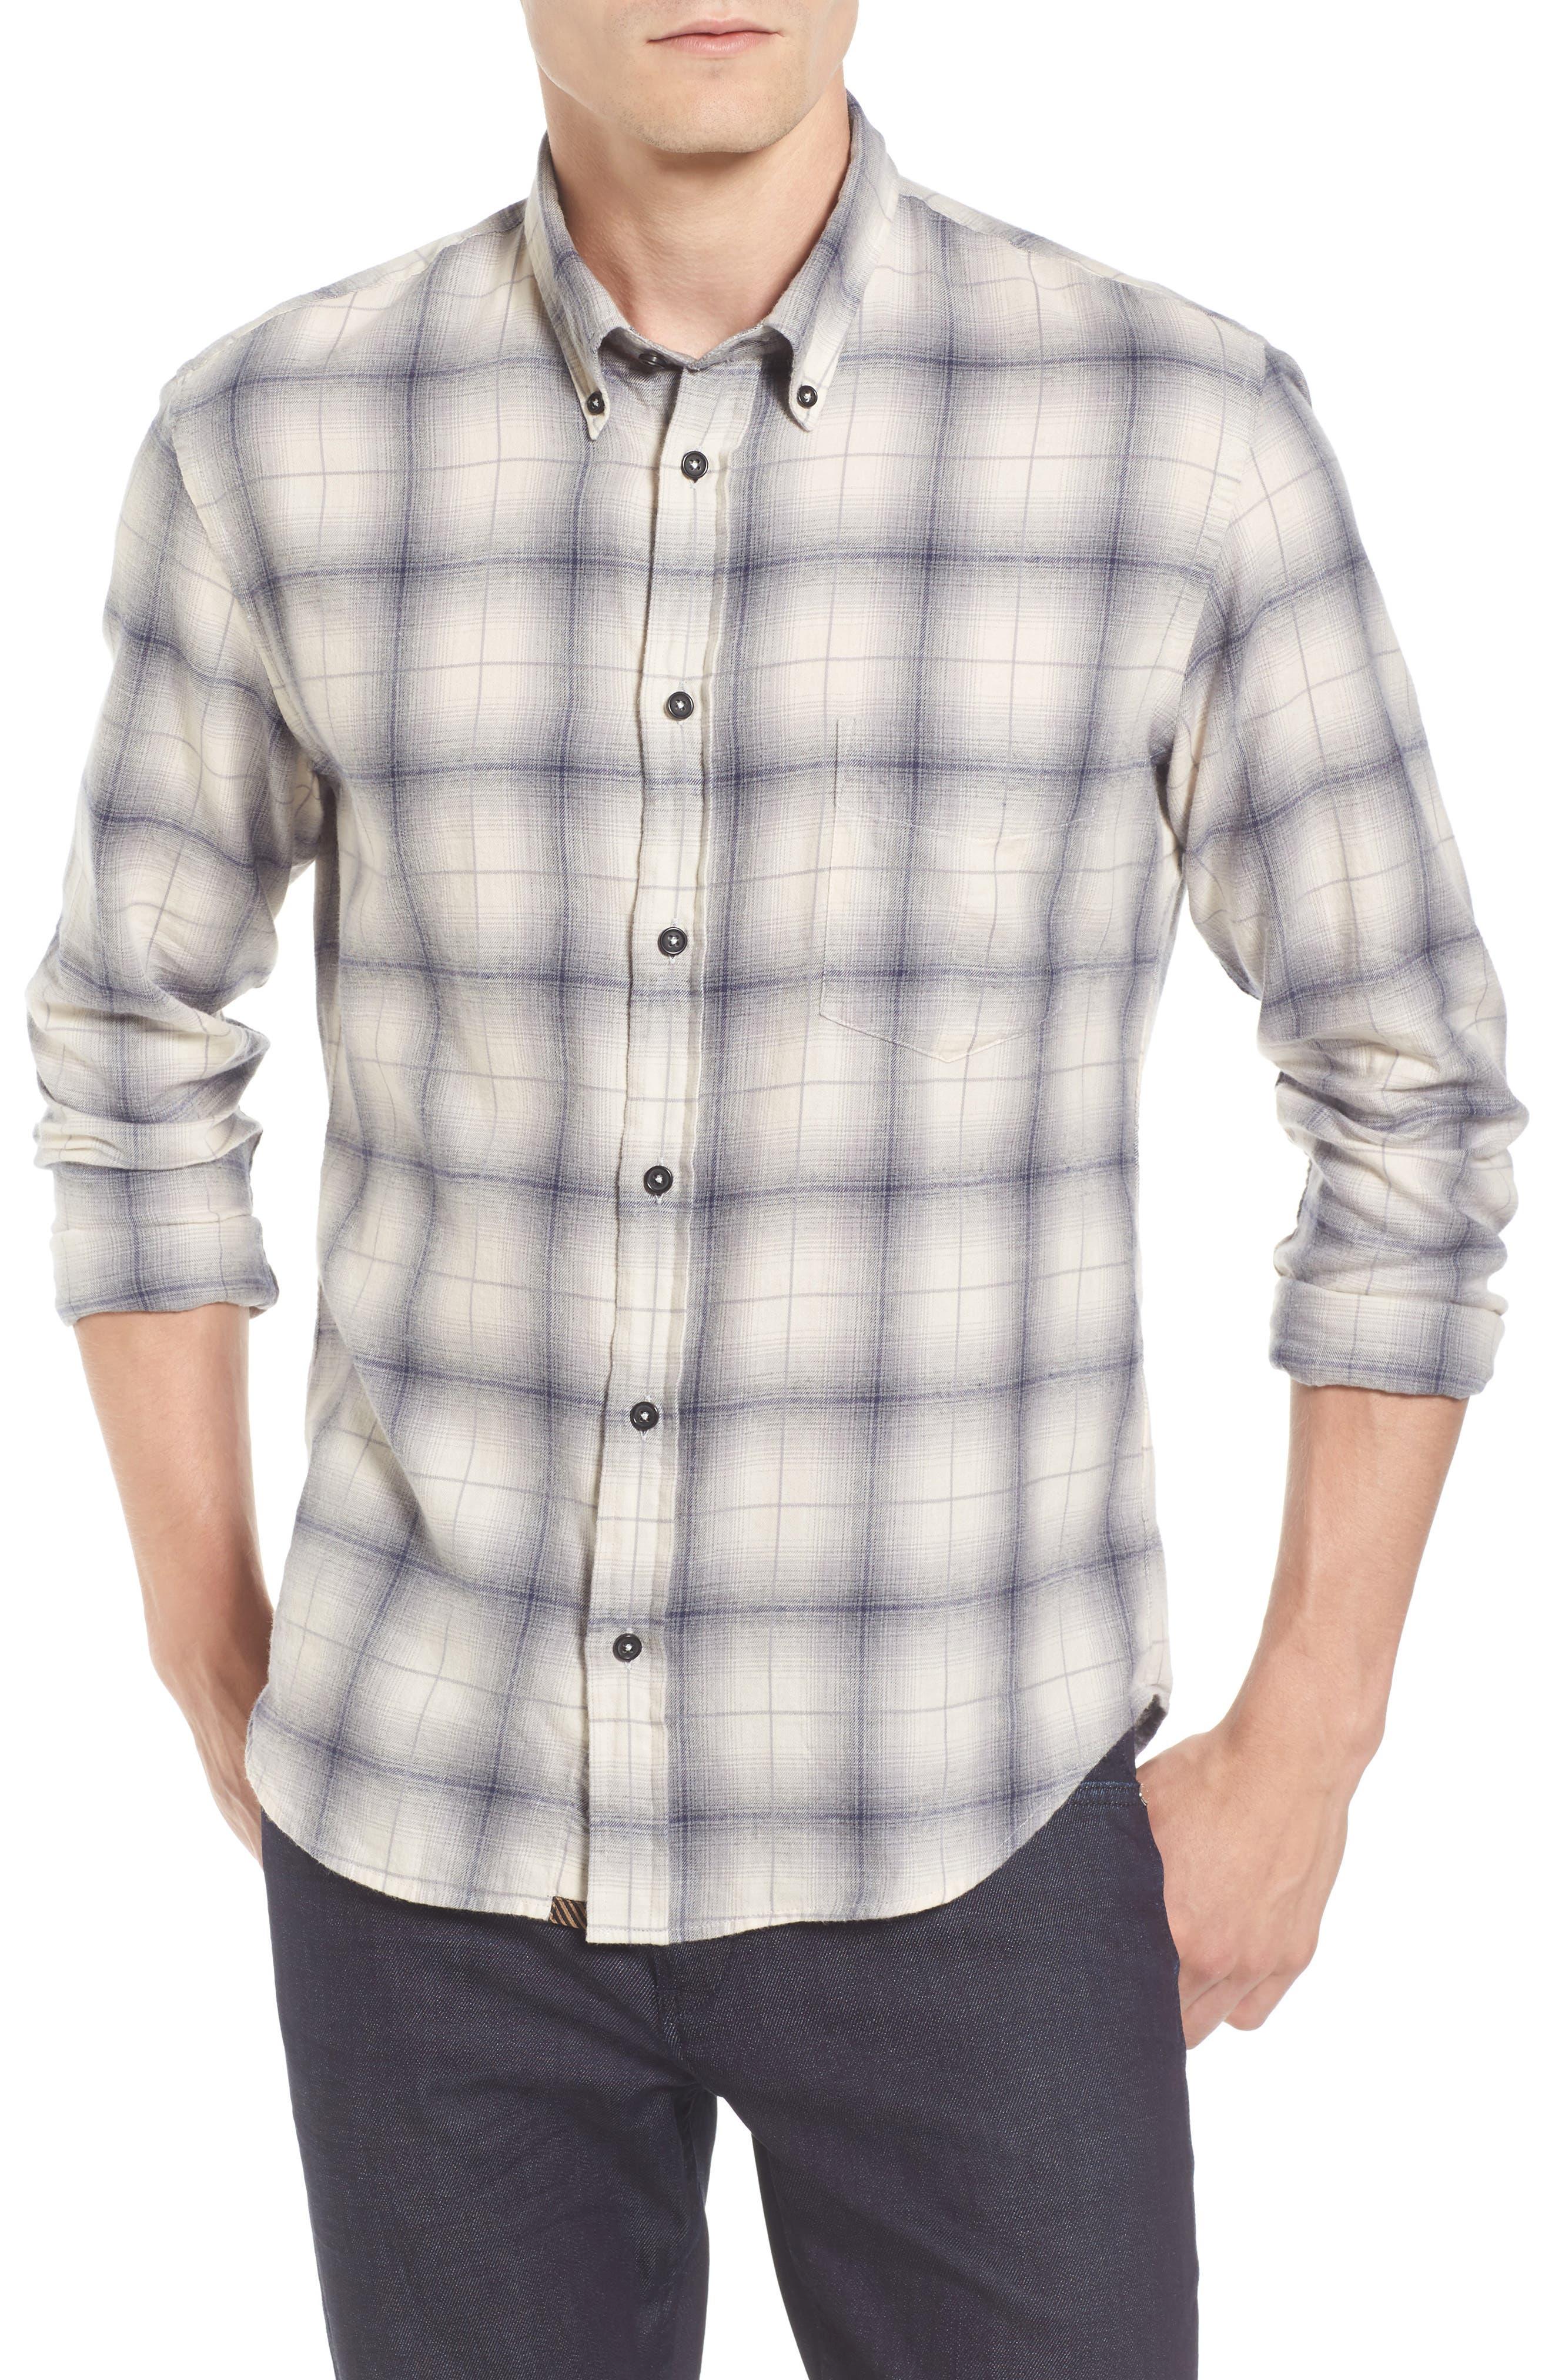 Kirby Slim Fit Plaid Flannel Shirt,                         Main,                         color, 070